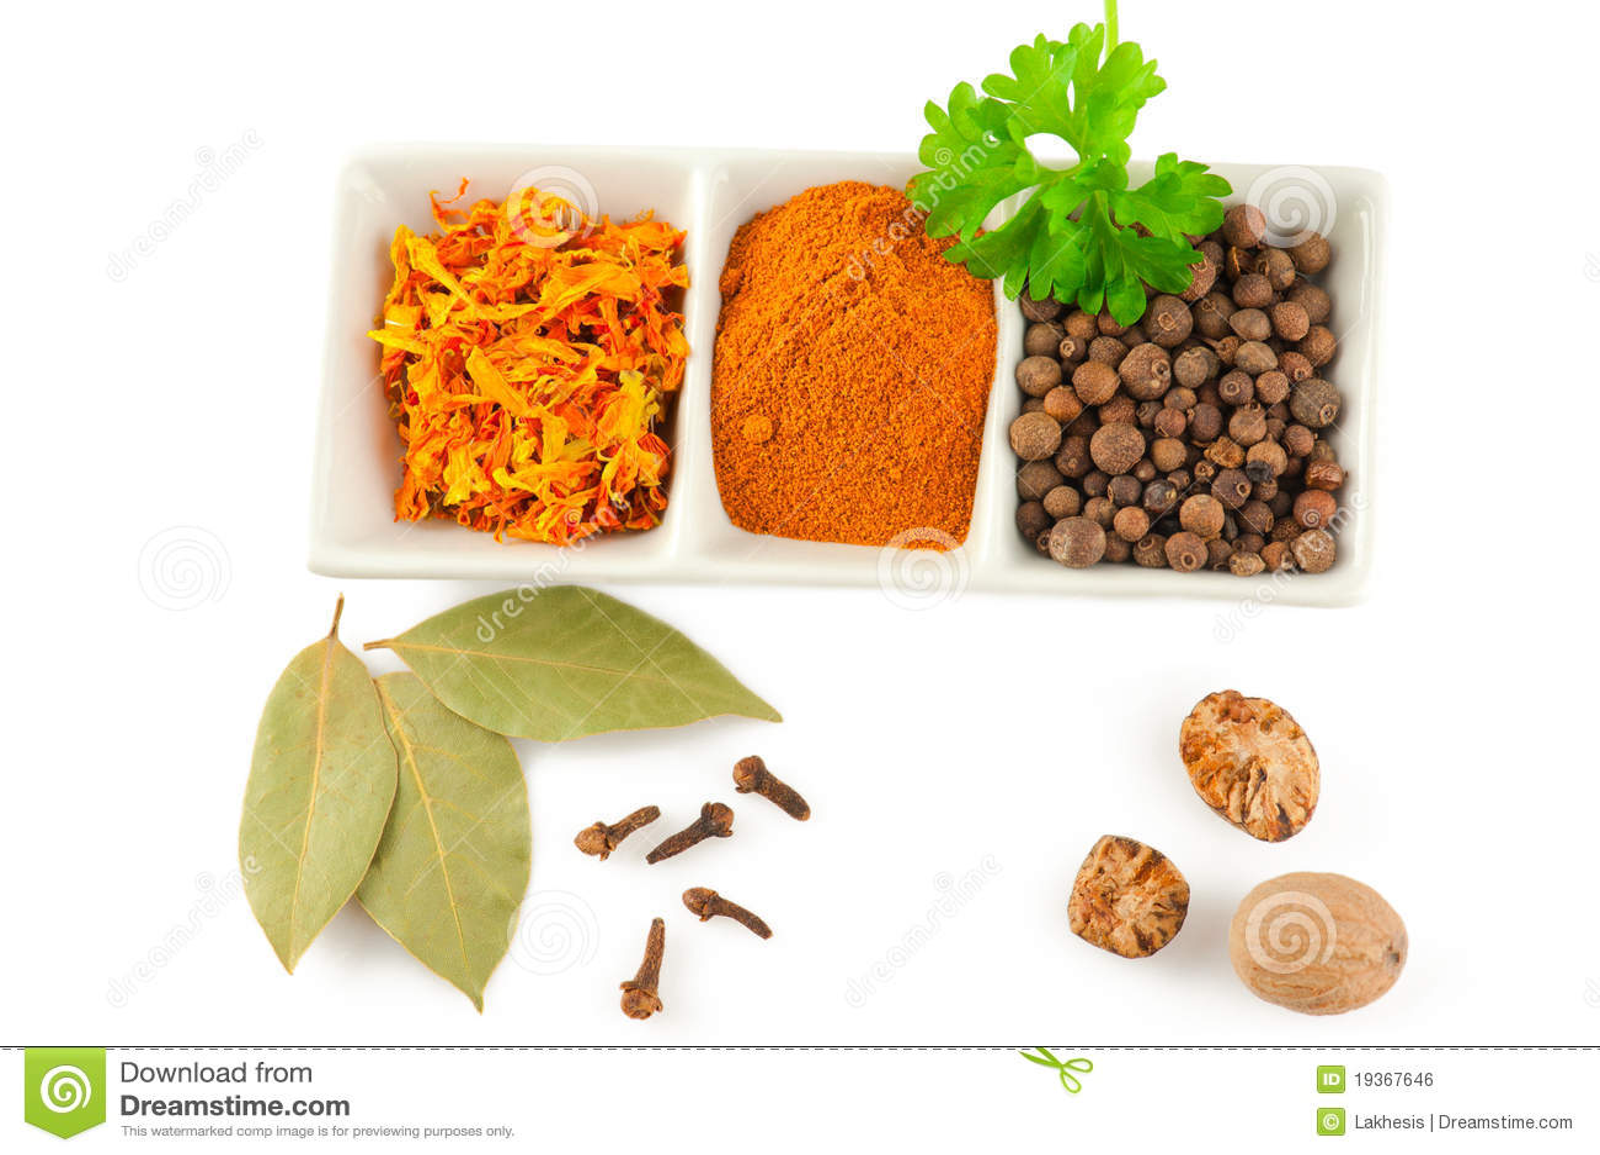 Especiarias. Mistura de ervas diferentes